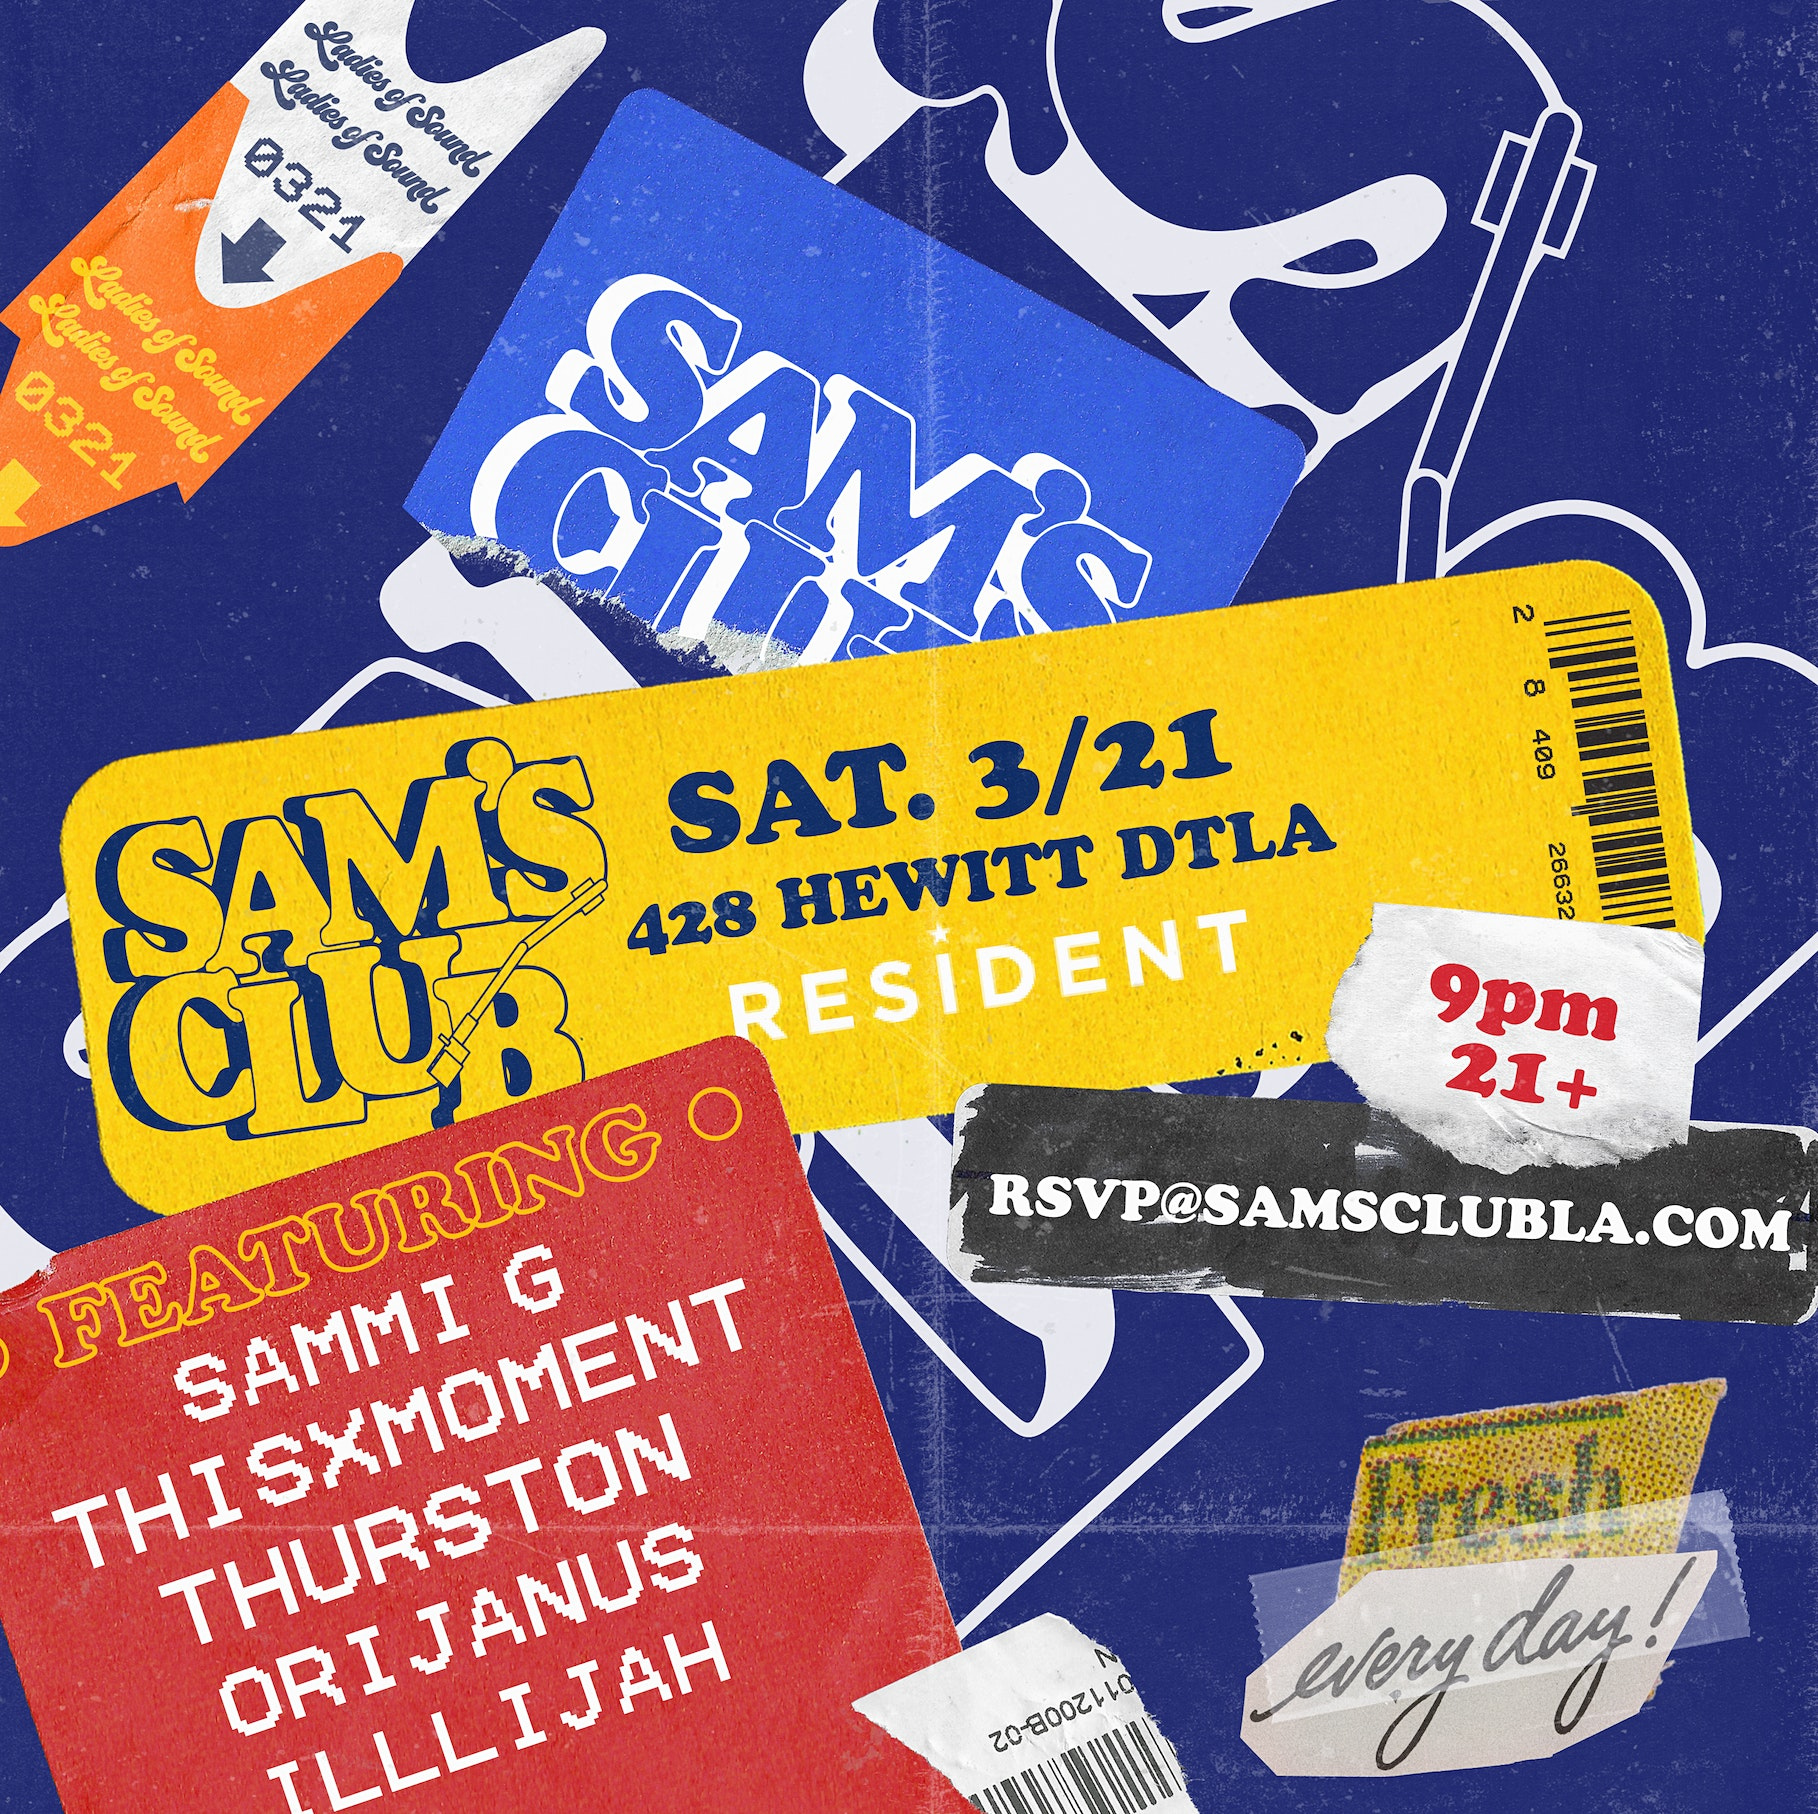 Cancelled // Sam's Club • DJs x Live Beats